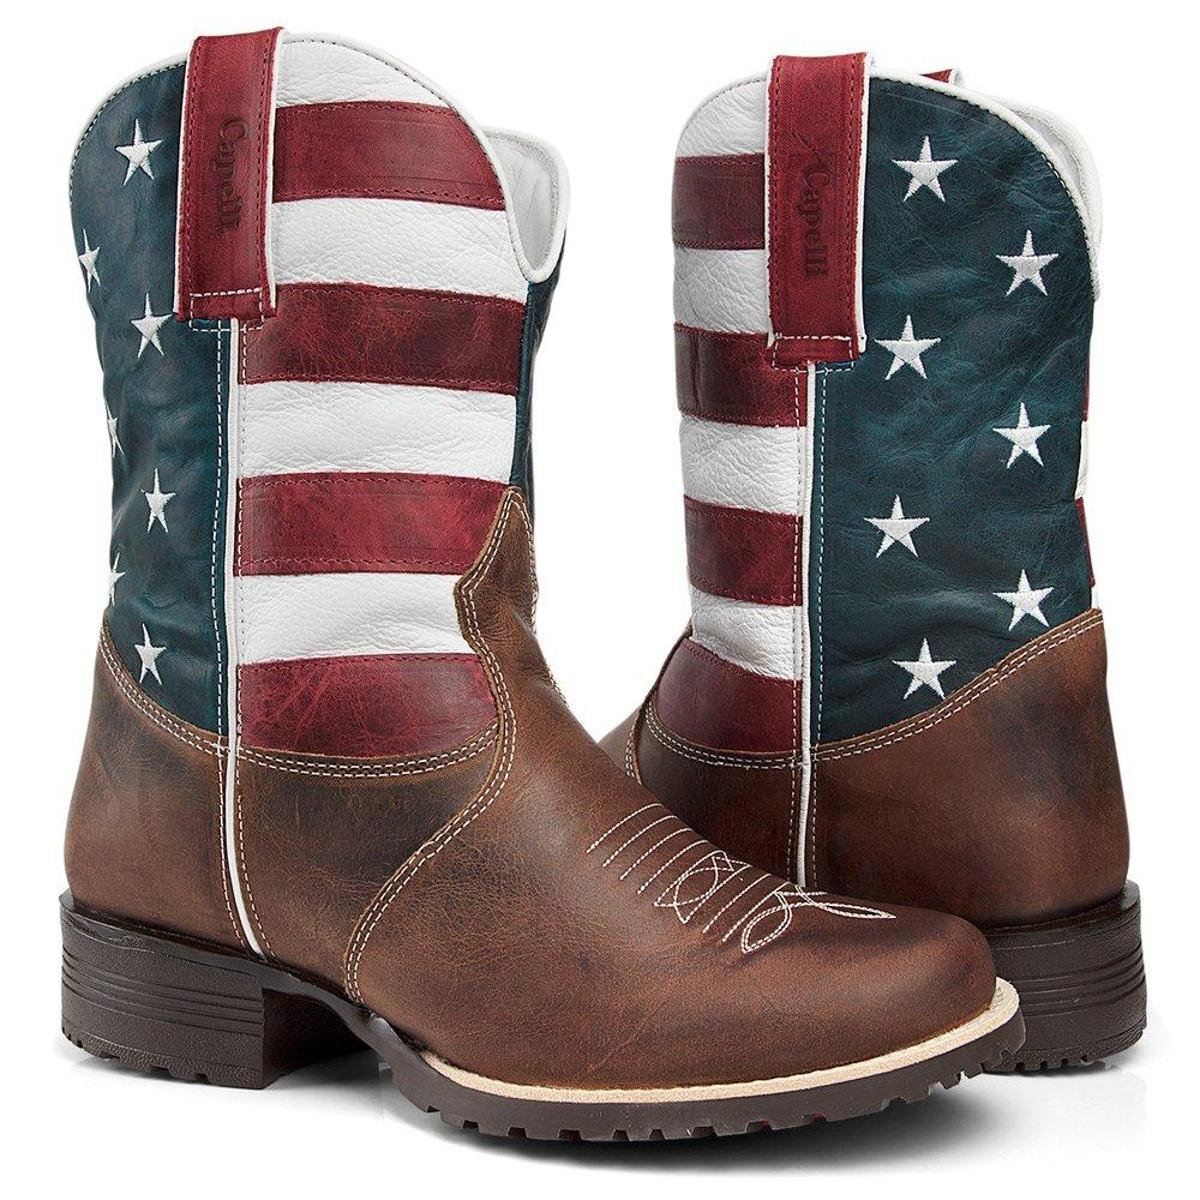 81bfd97f1e Bota Texana Country Capelli Boots Couro Bandeira USA Bico Redondo Masculina  - Marrom | Zattini